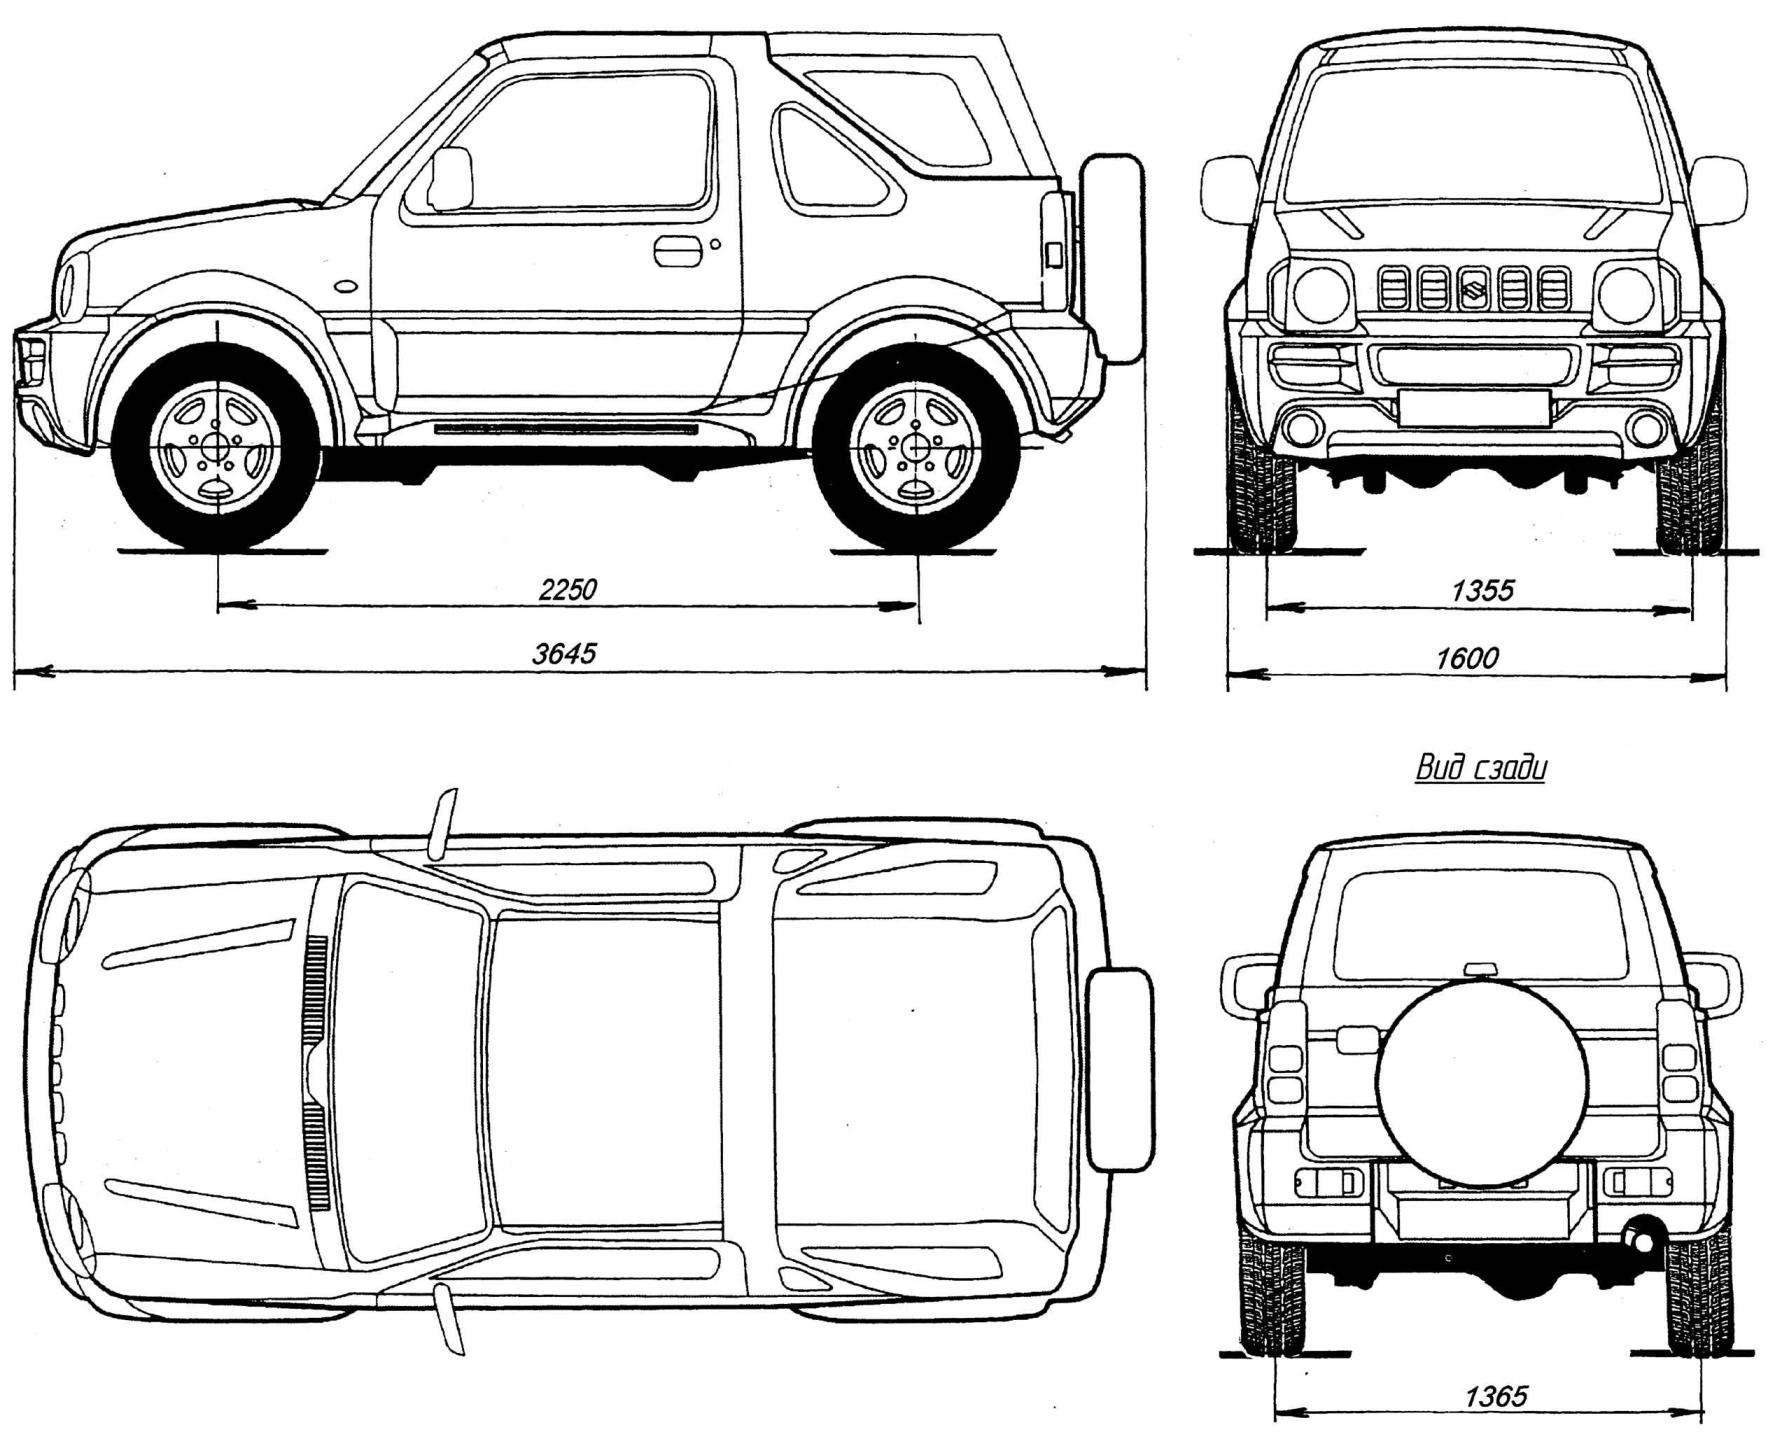 Геометрическая схема Suzuki Jimny Cabrio с кузовом типа «кабриолет»